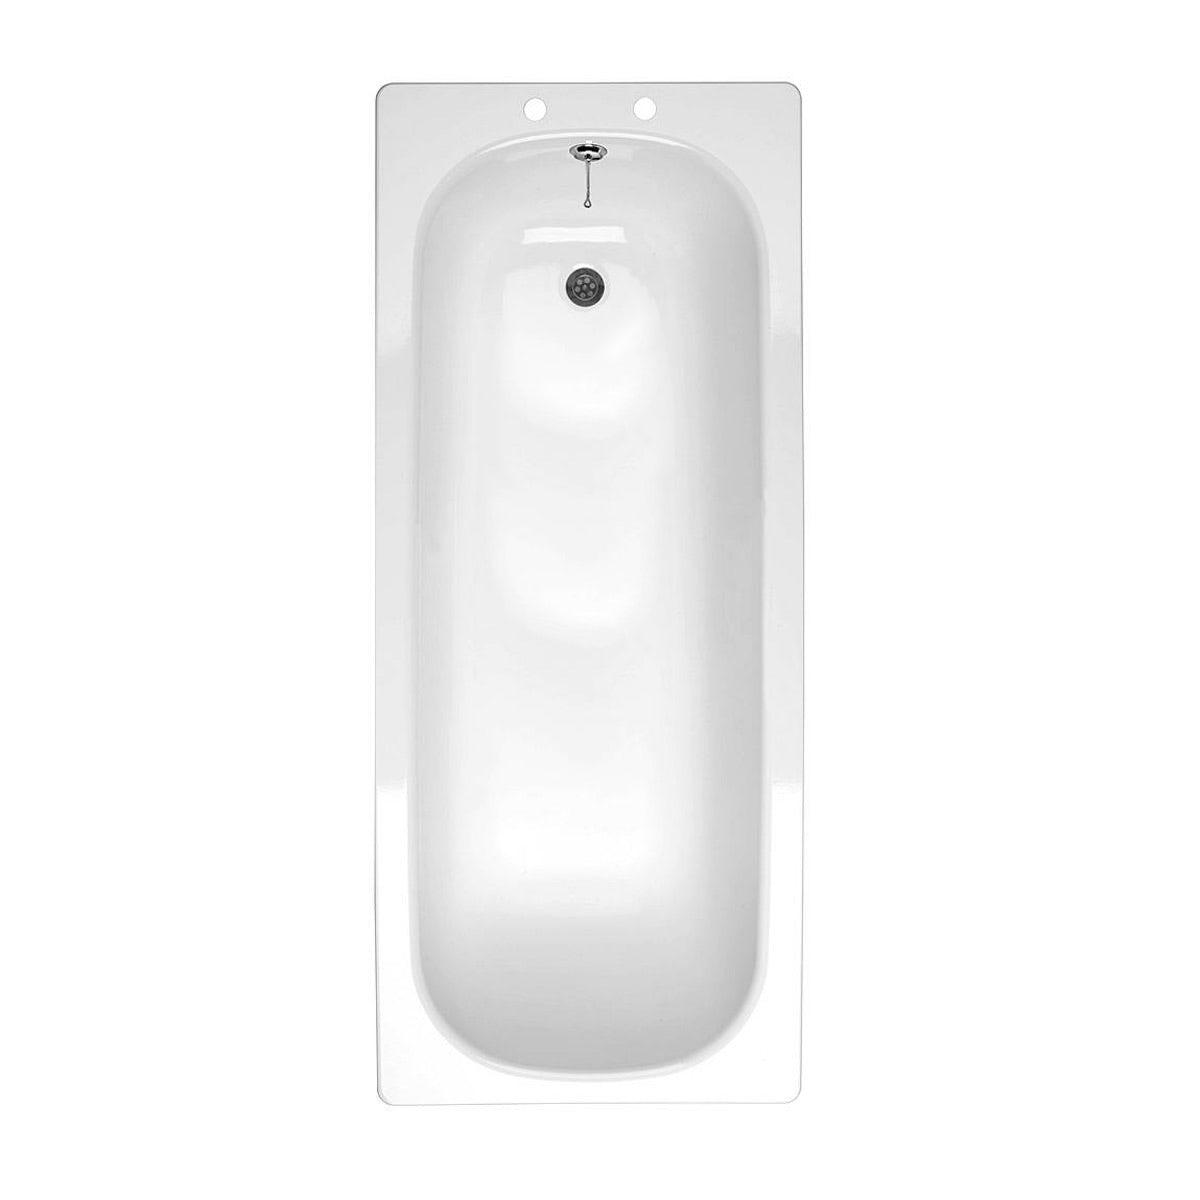 Clarity single ended steel bath